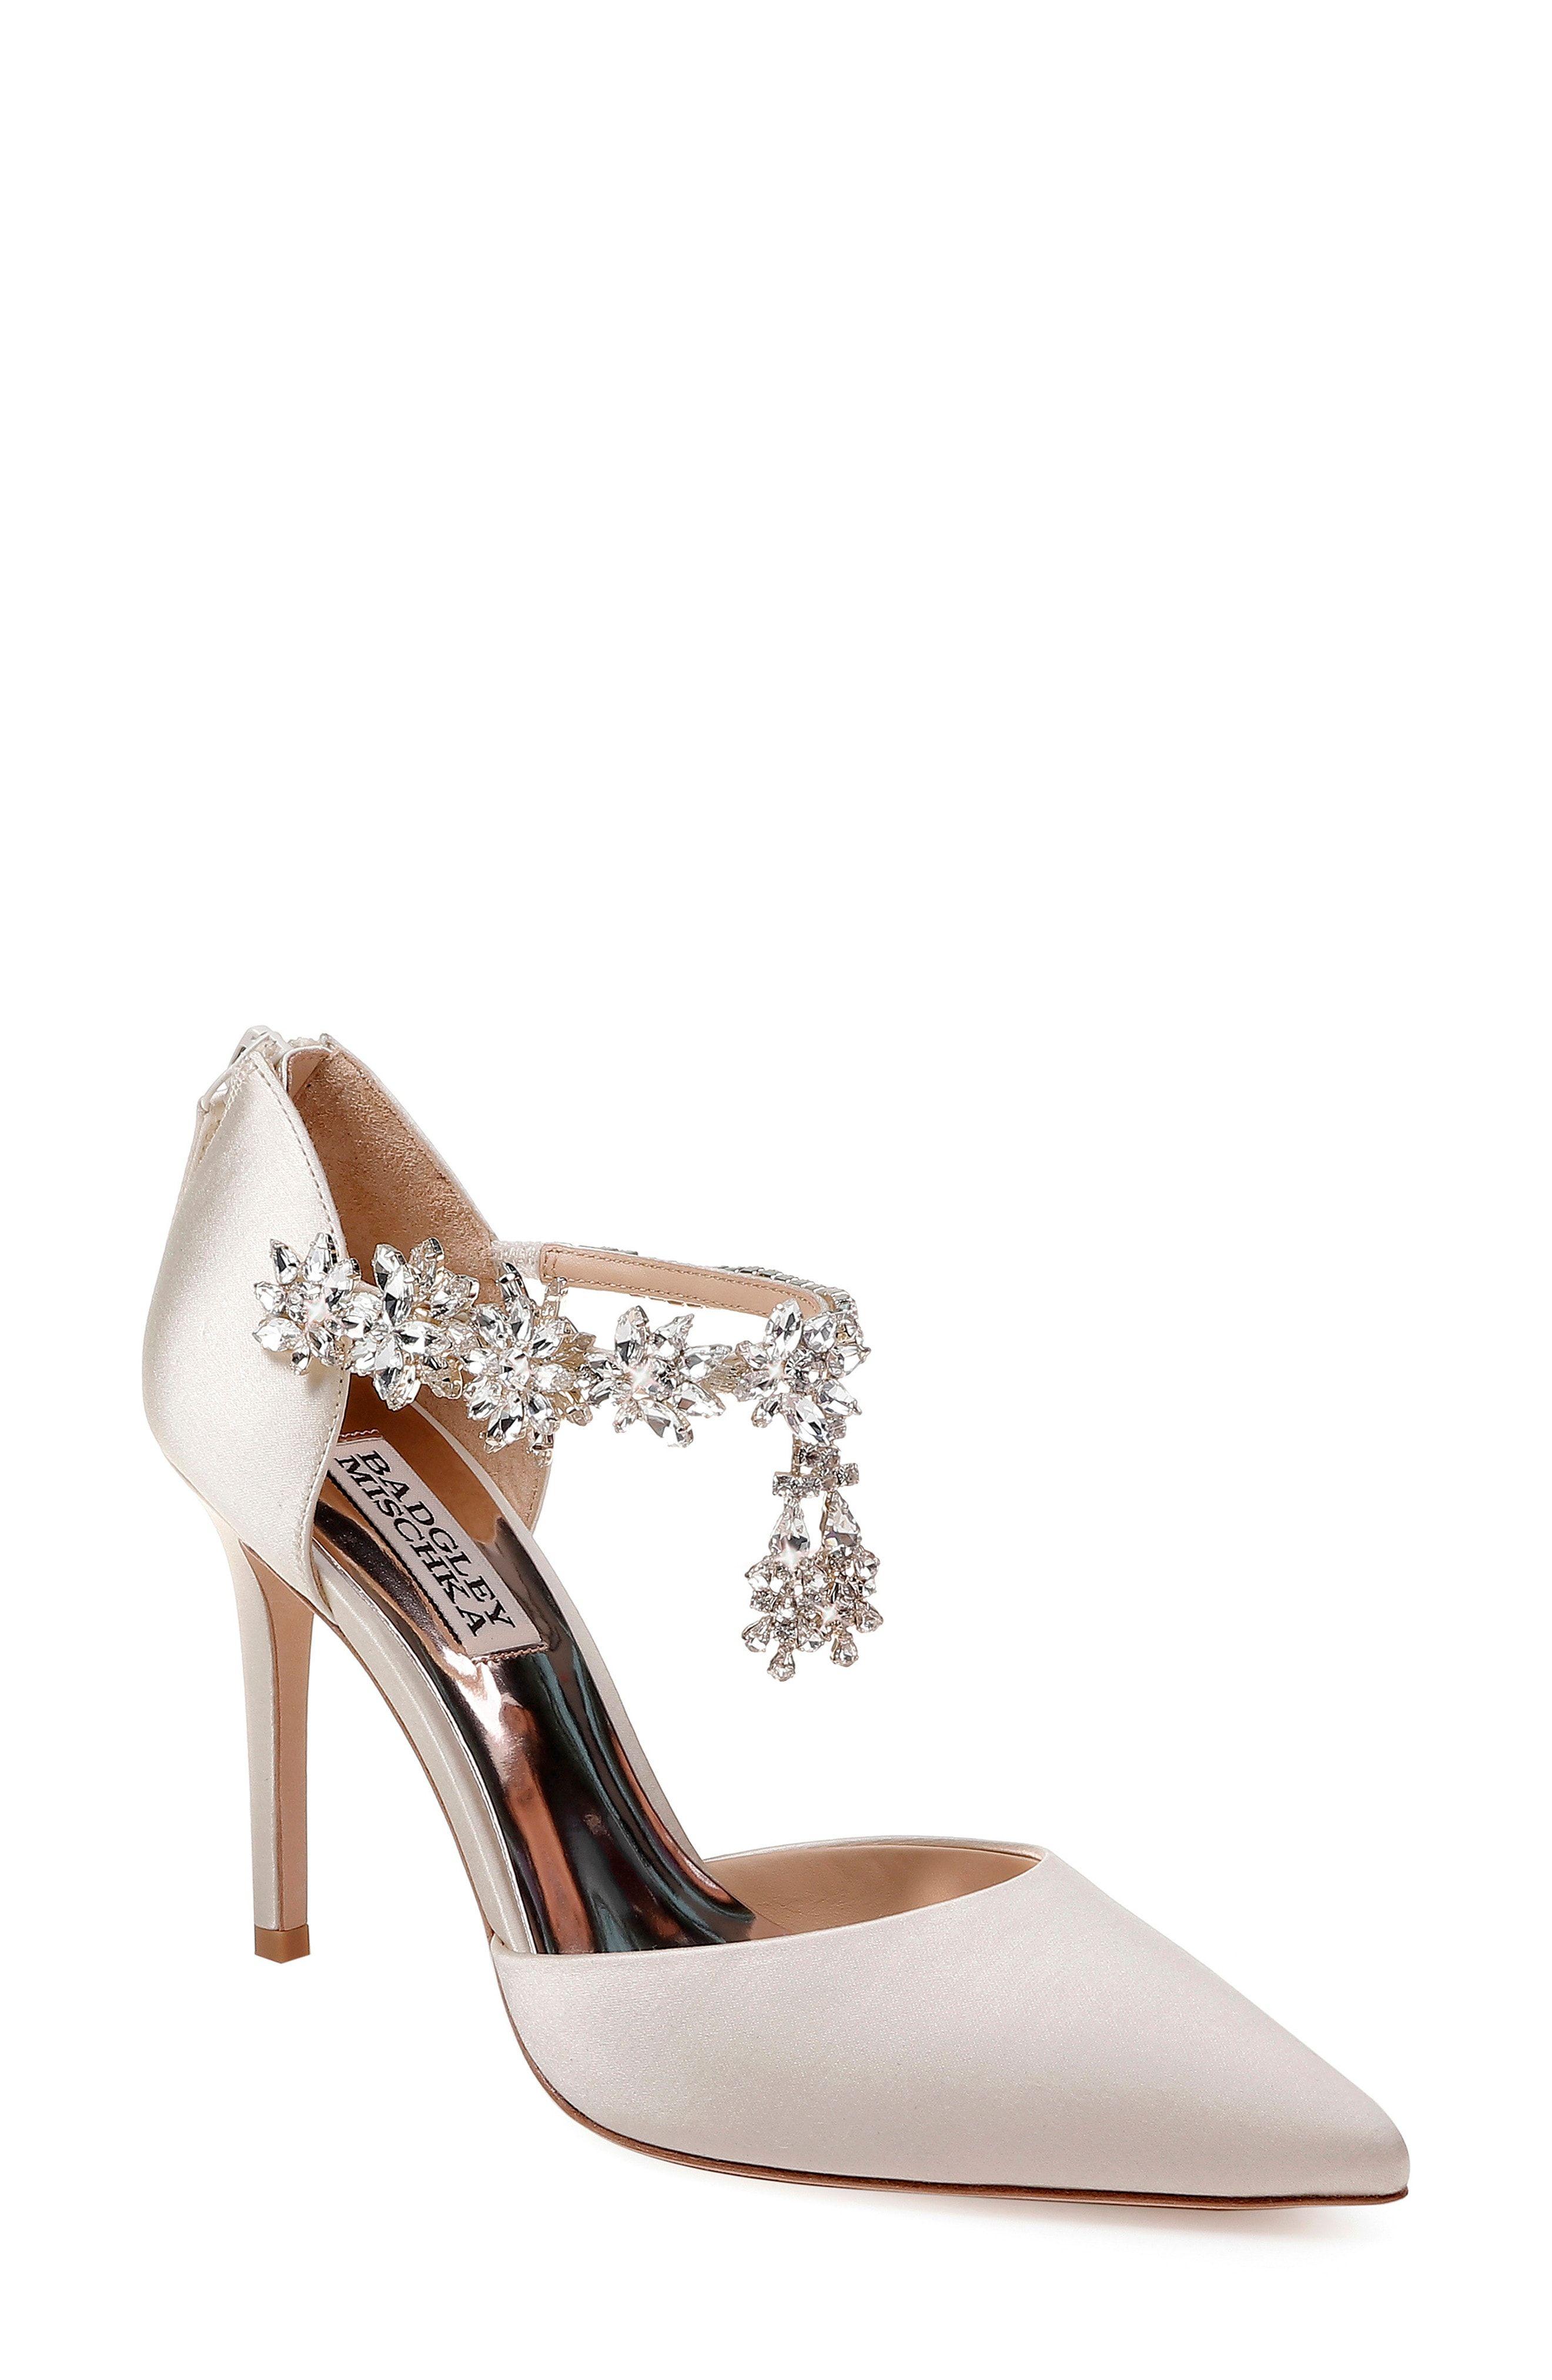 ca1dbd681 12 Most Comfortable Wedding Shoes